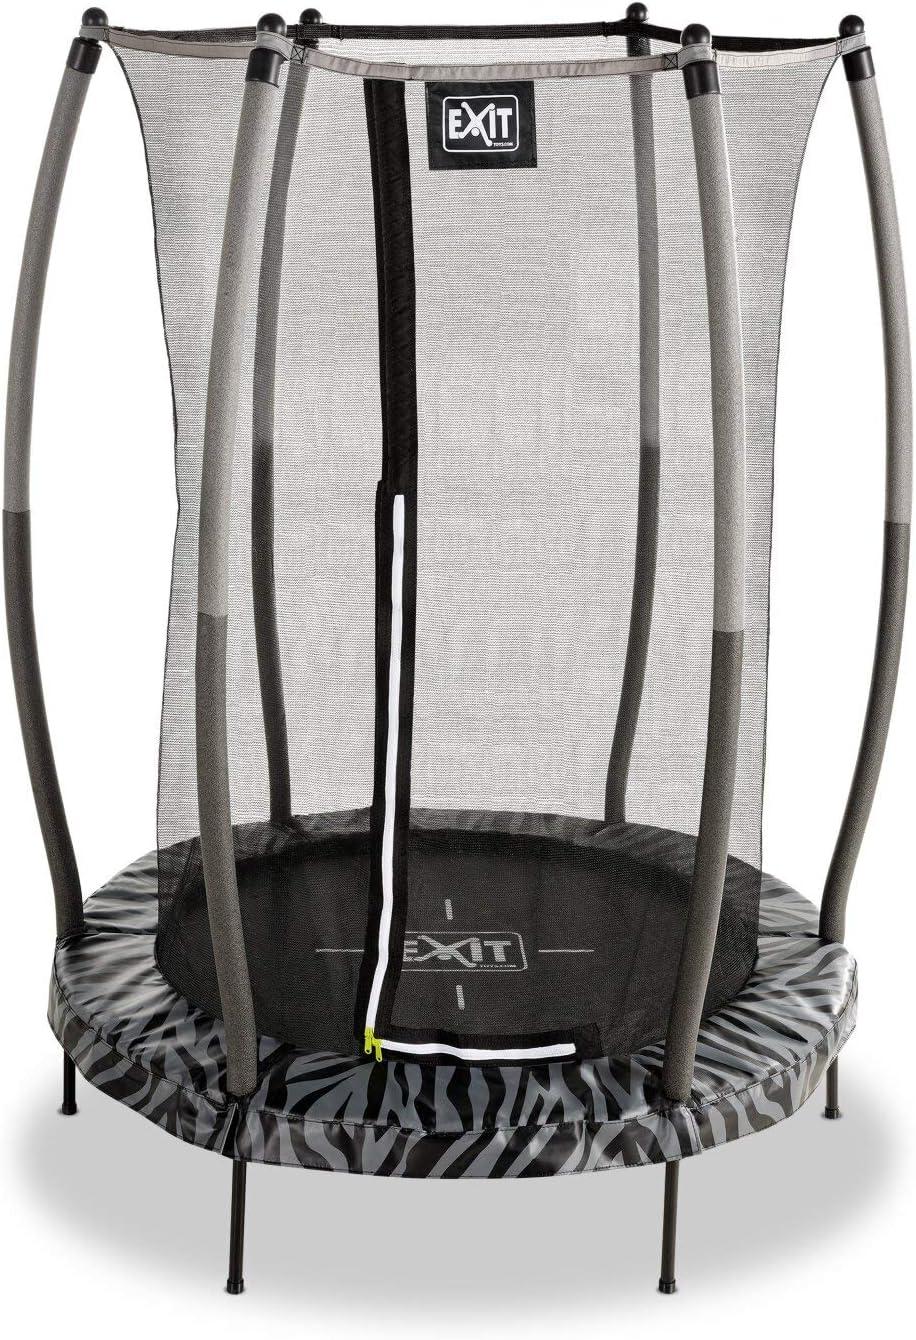 EXIT Tiggy Junior Trampoline 140cm Noir avec Filet de securite